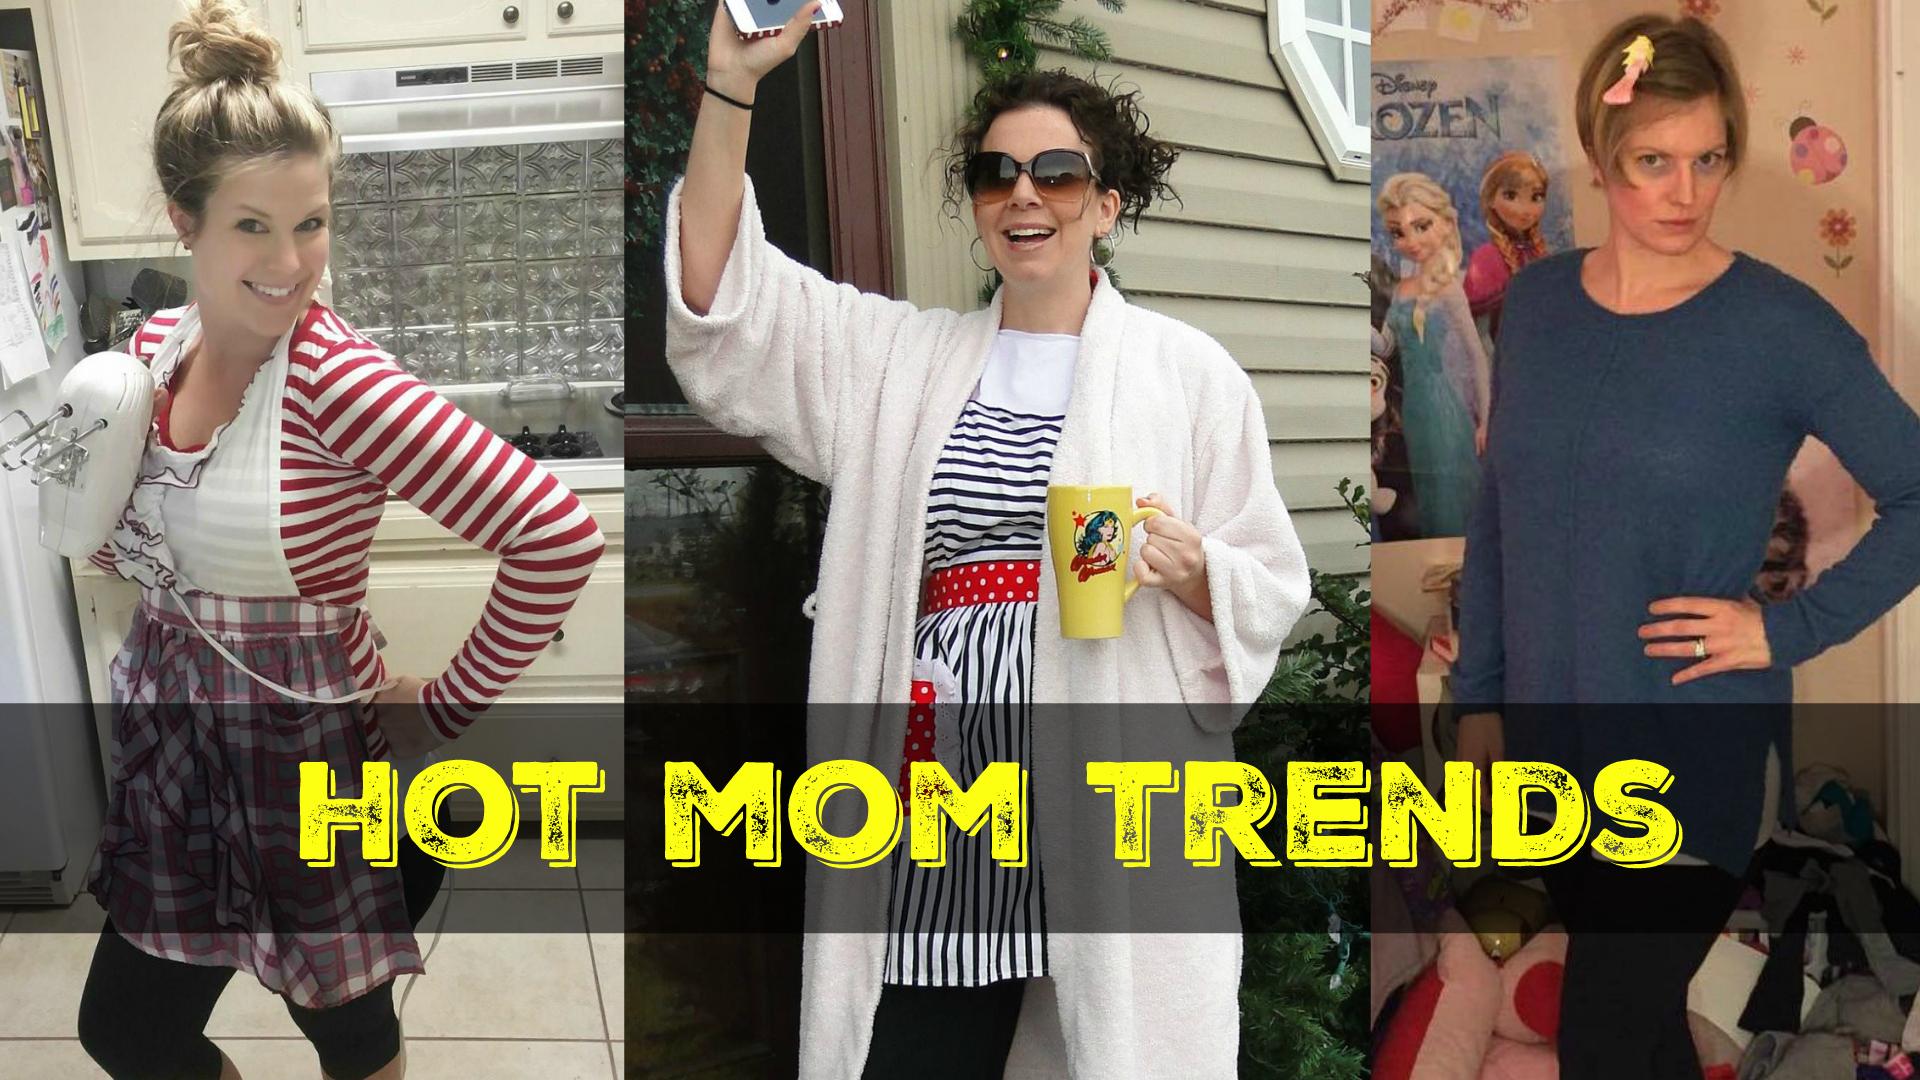 Hot Mom Trends Awards Season Fashion Police Spoof